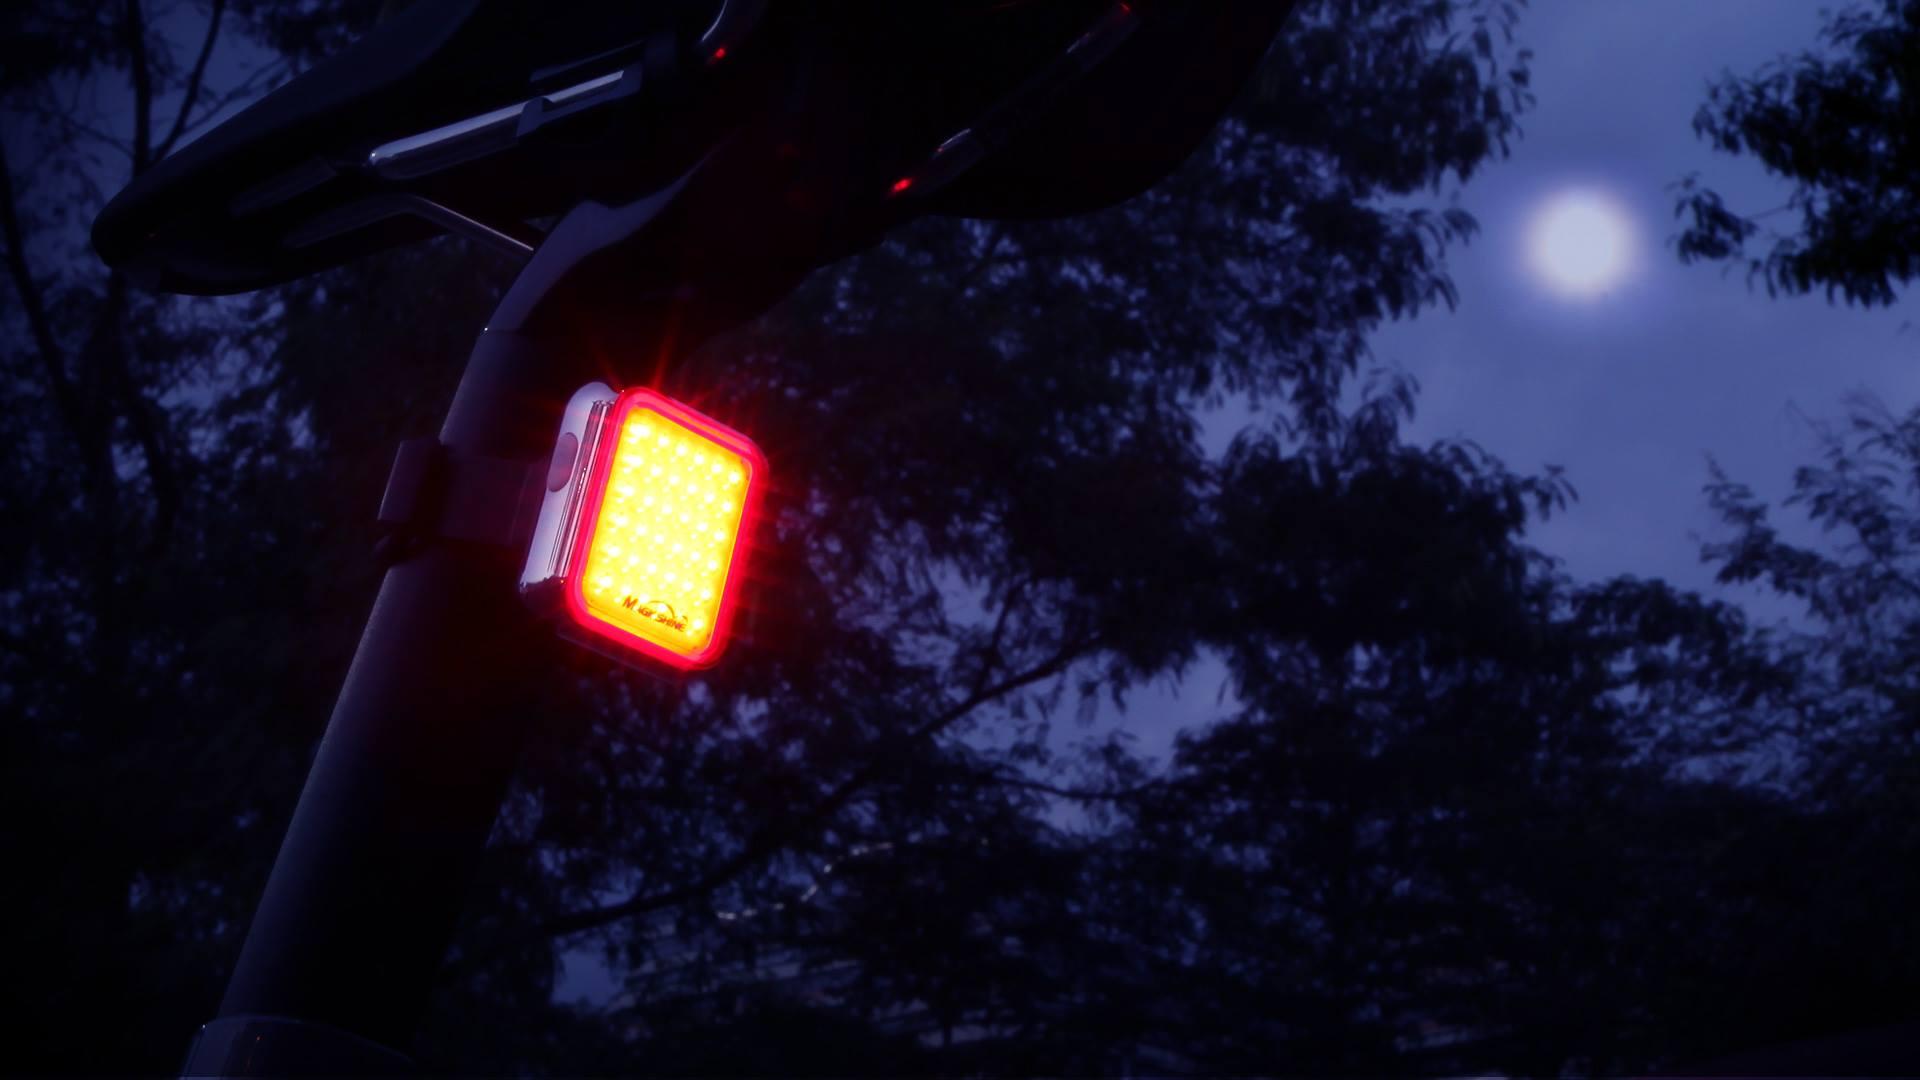 Seemee 60 Bike Tail Light Brand New Magicshine 2018